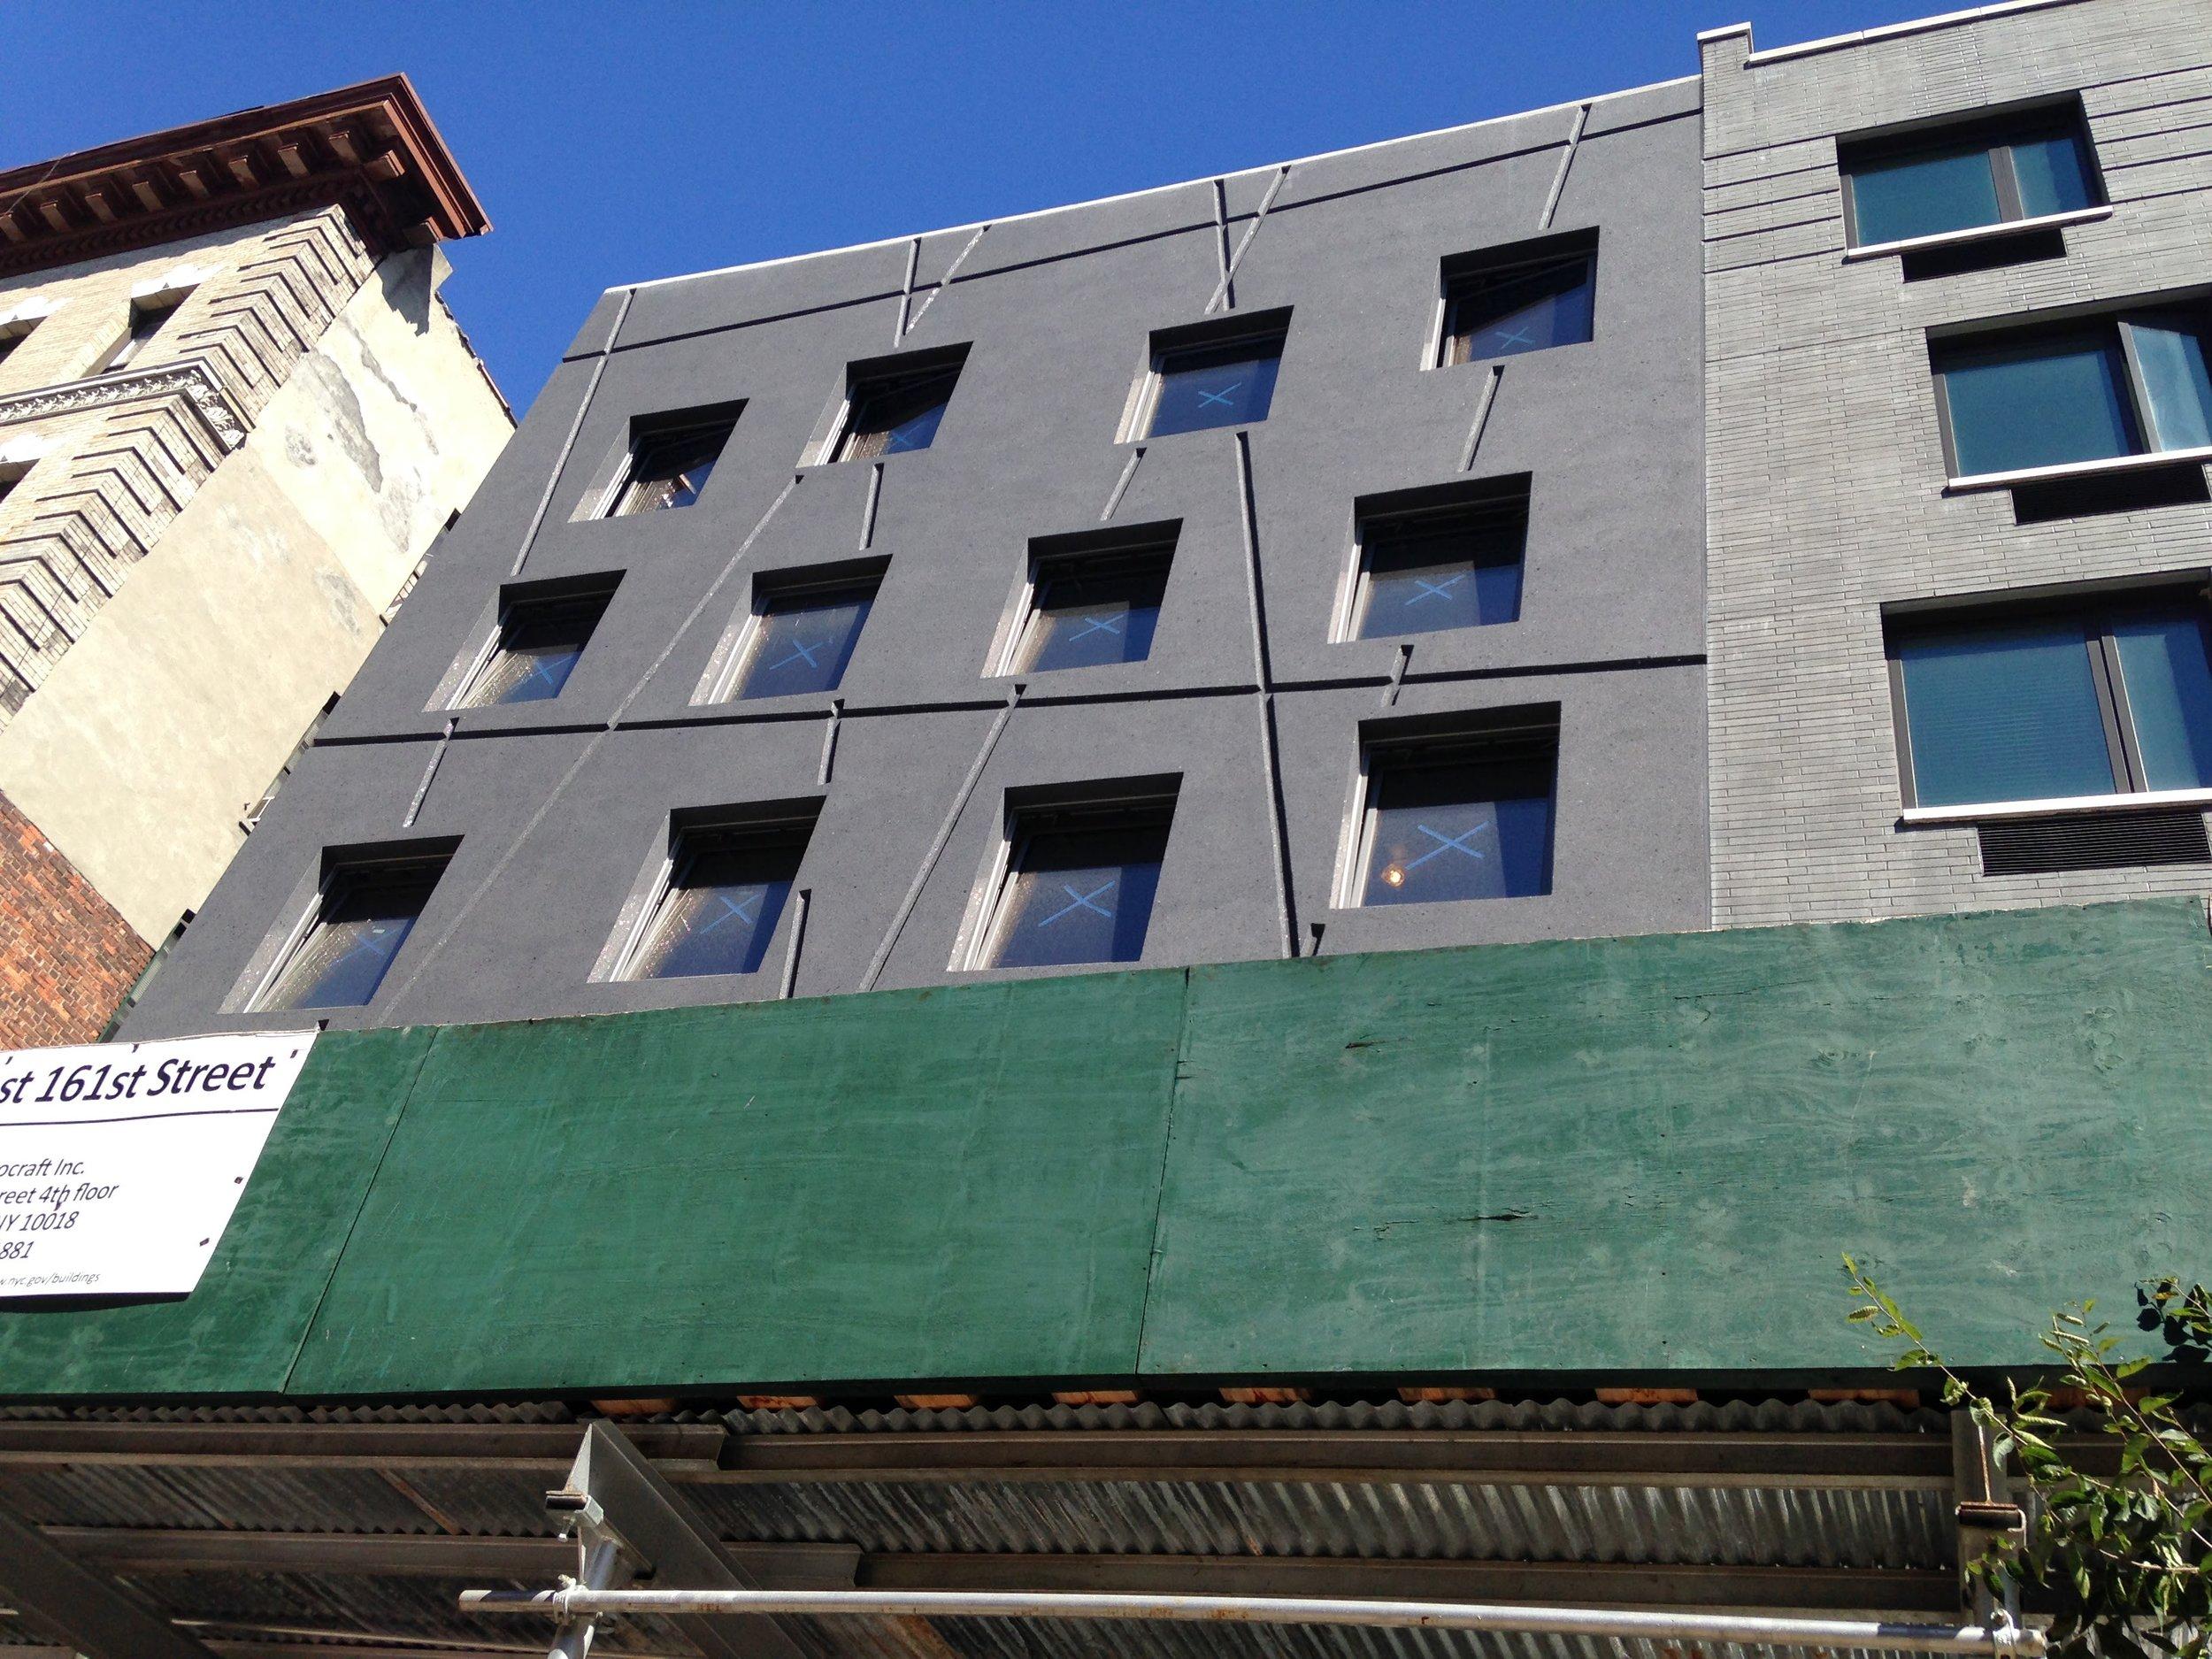 South facade from street_2.jpg